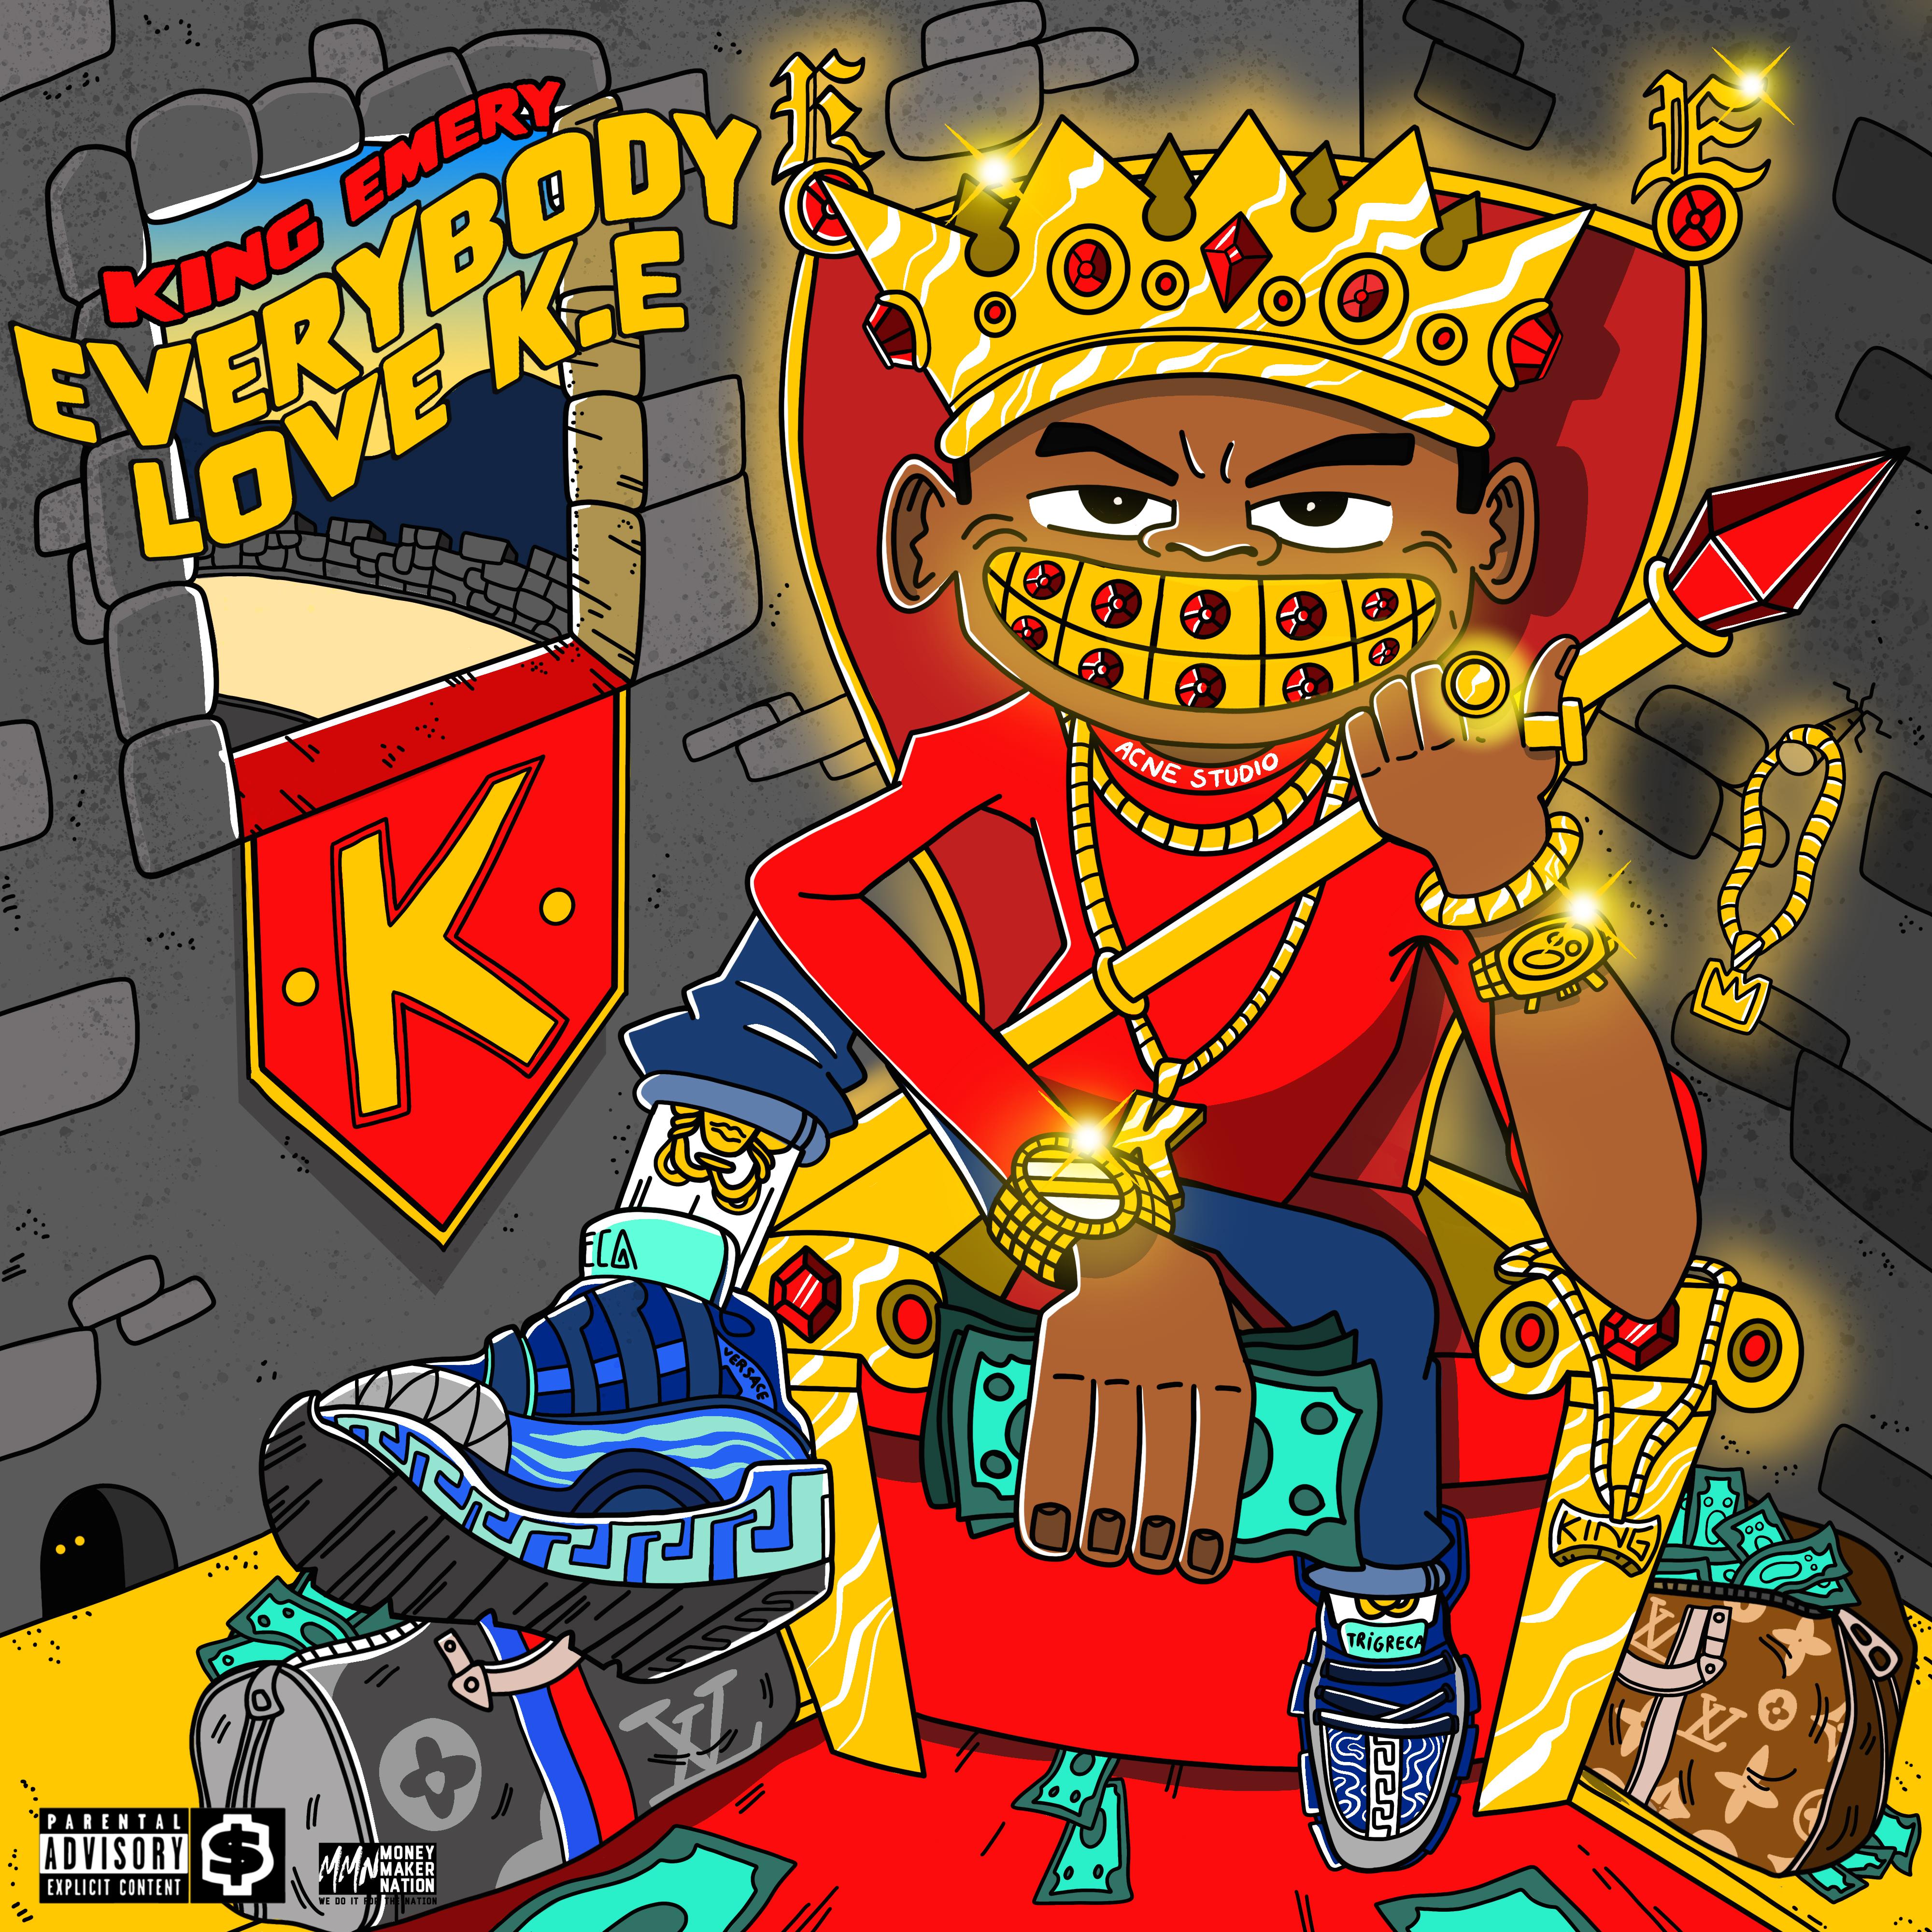 KingEmery-Everybody